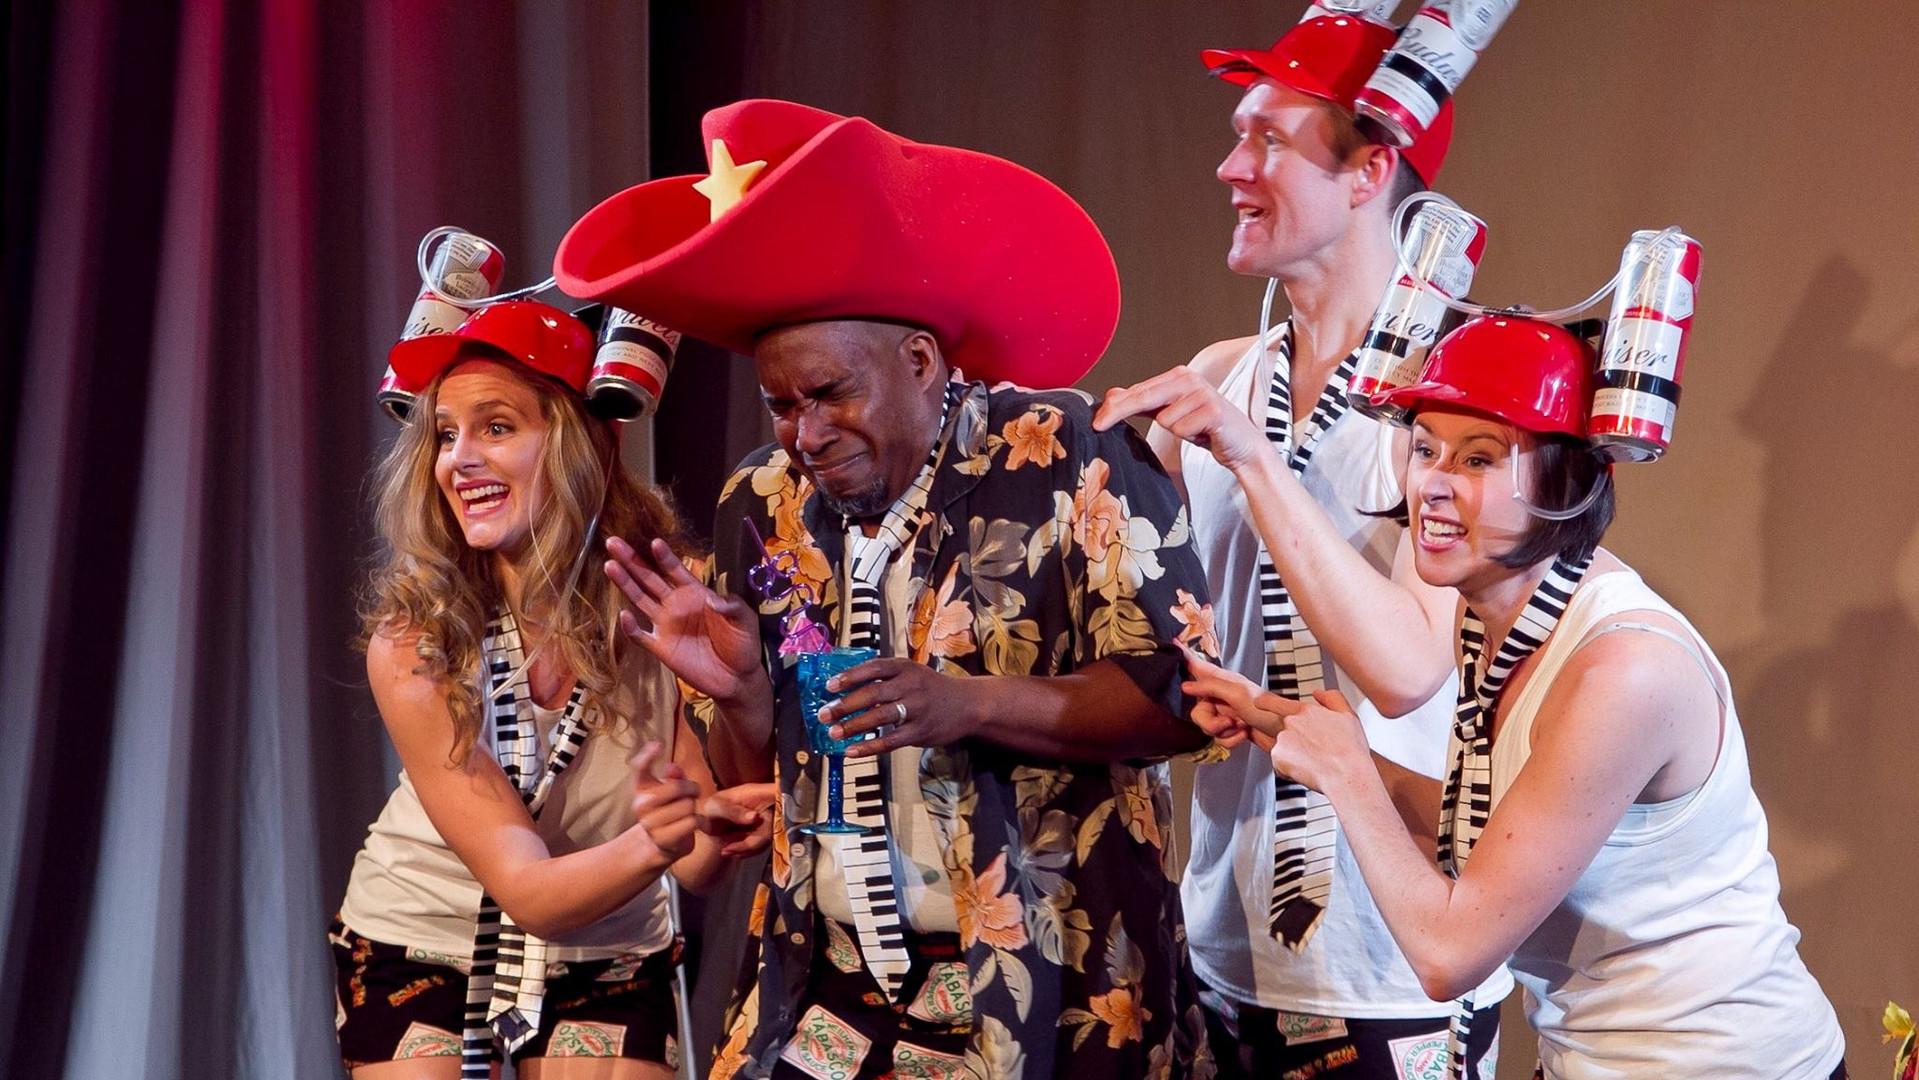 Performing in Flash Operas